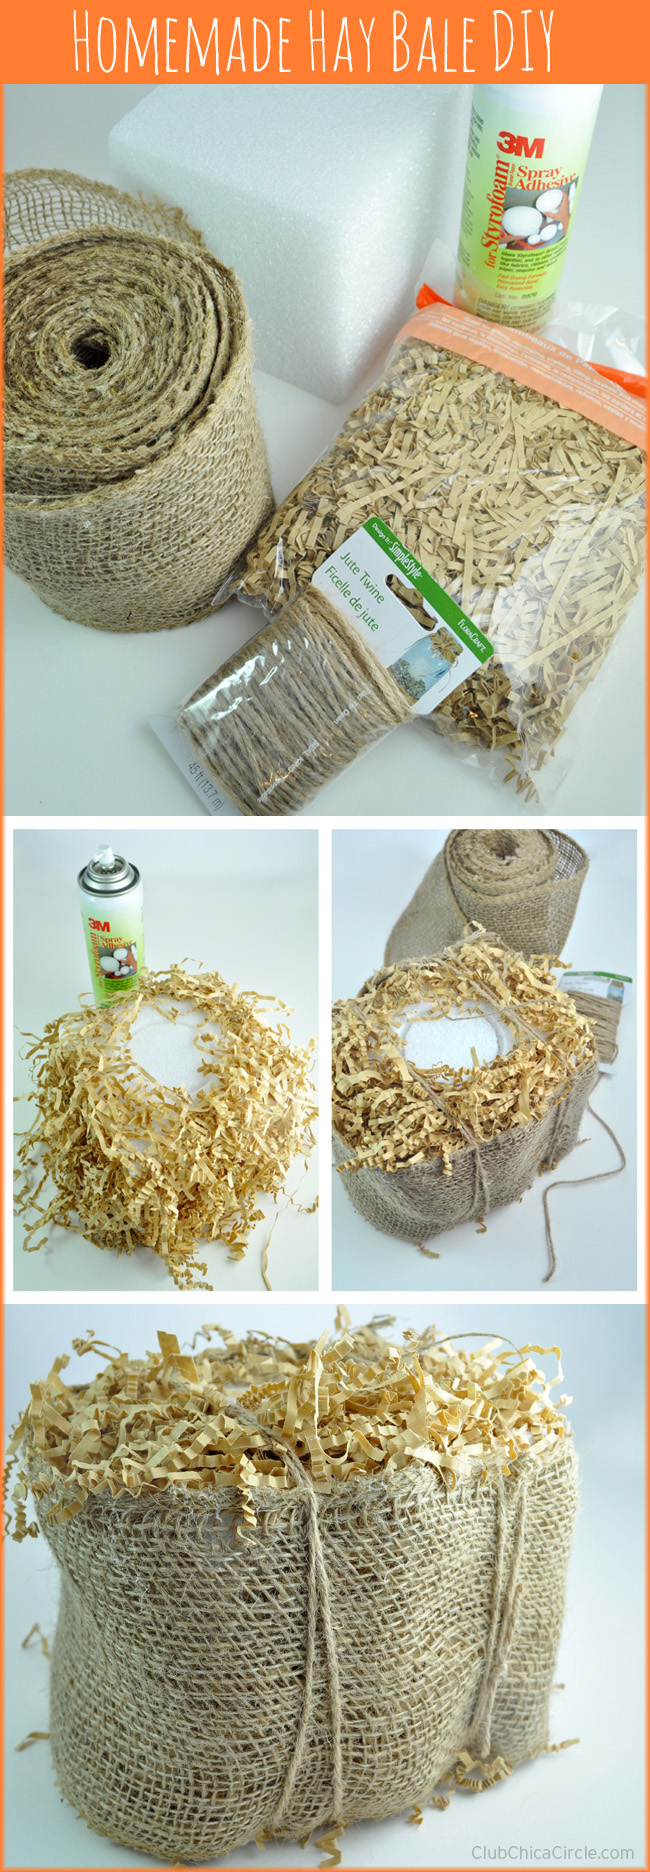 Homemade Hay Bale Craft Tutorial